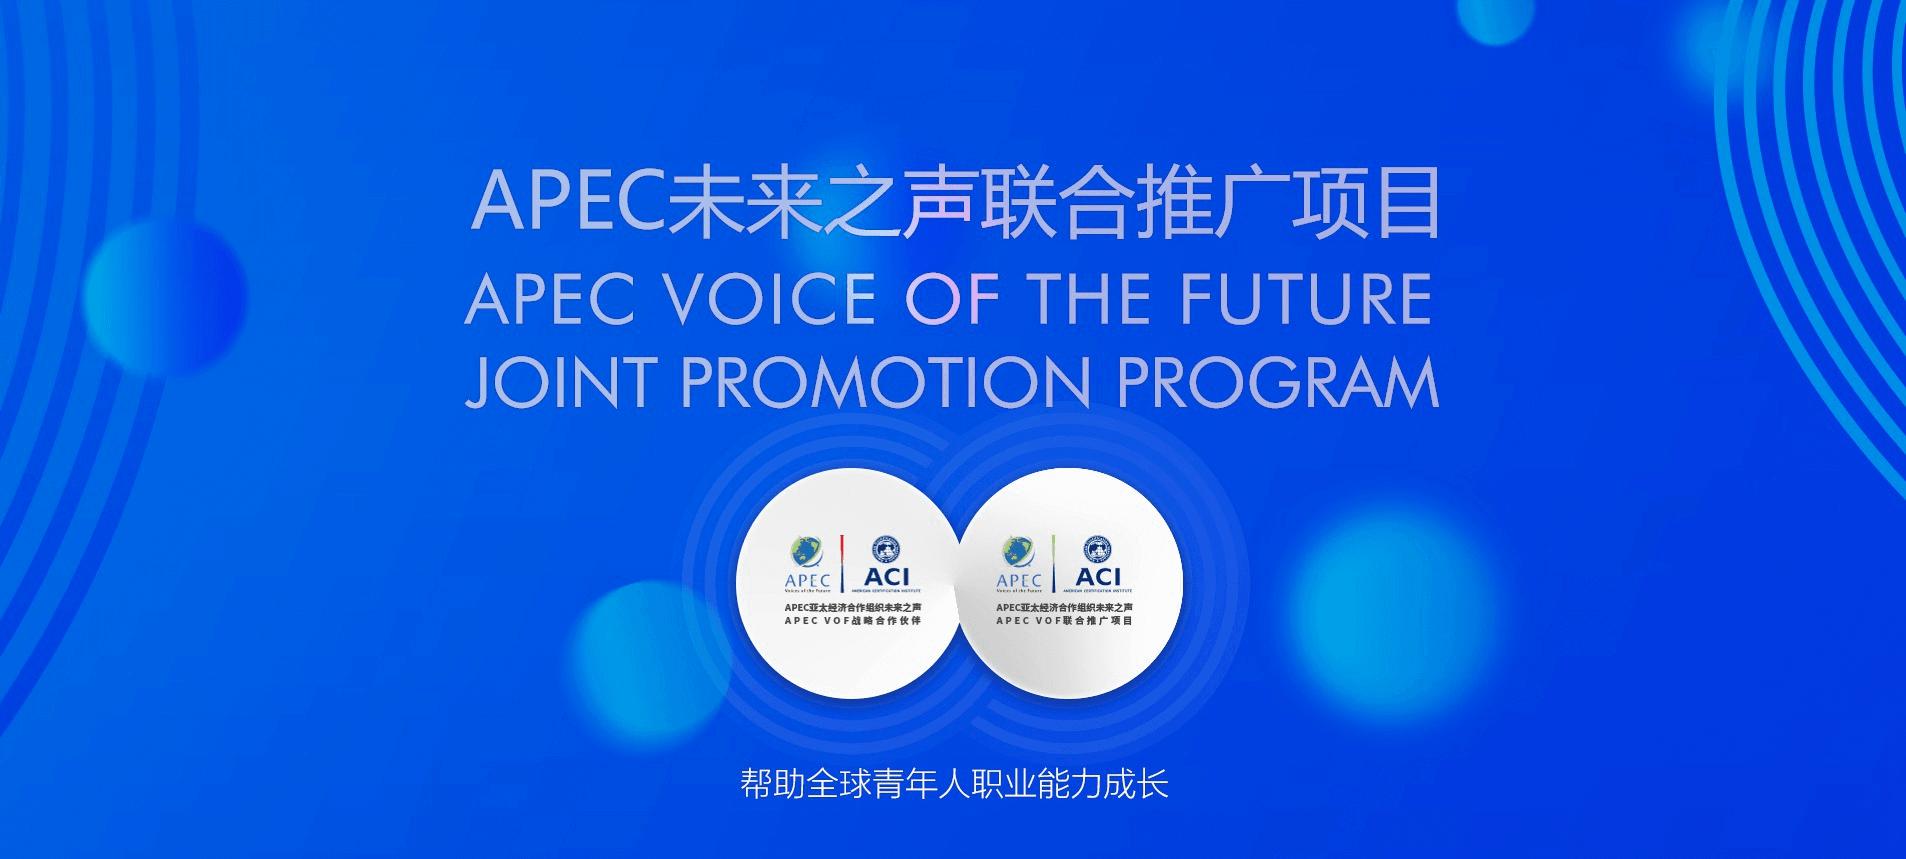 APEC未来之声联合推广项目